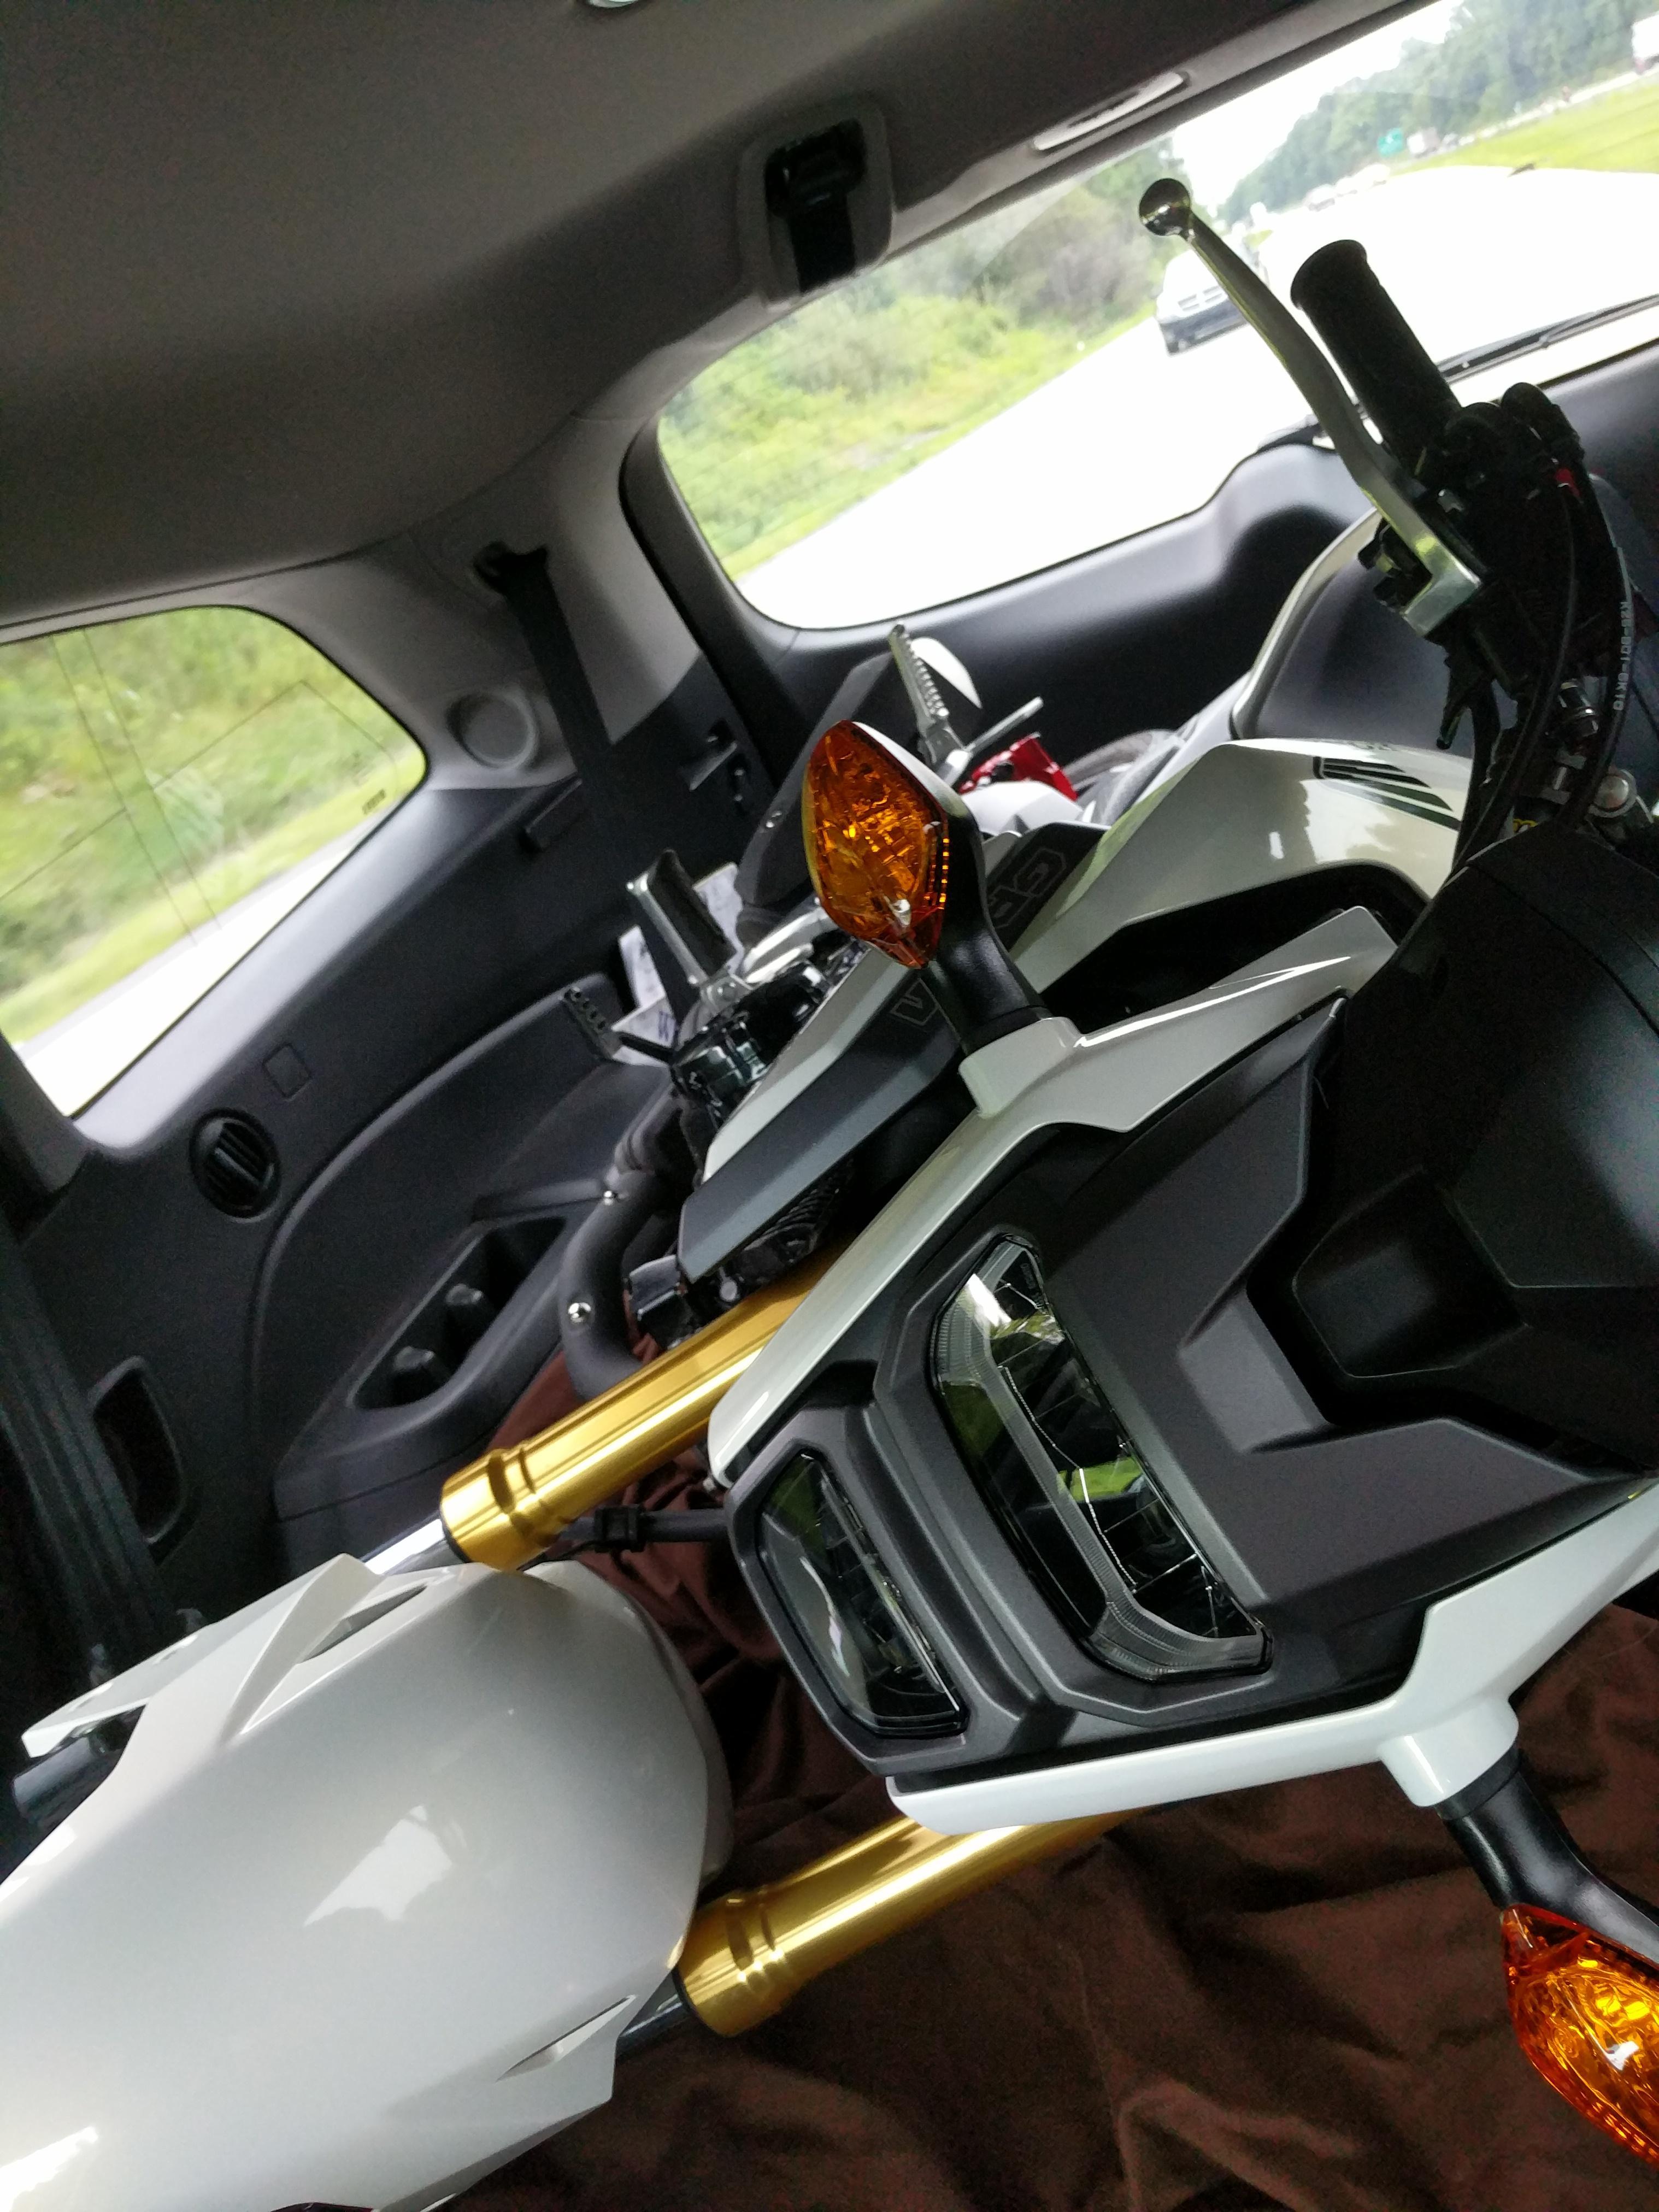 Used Honda Grom For Sale Craigslist : honda, craigslist, Moment,, Poorly, Transported, Craigslist, Snag., Hondagrom